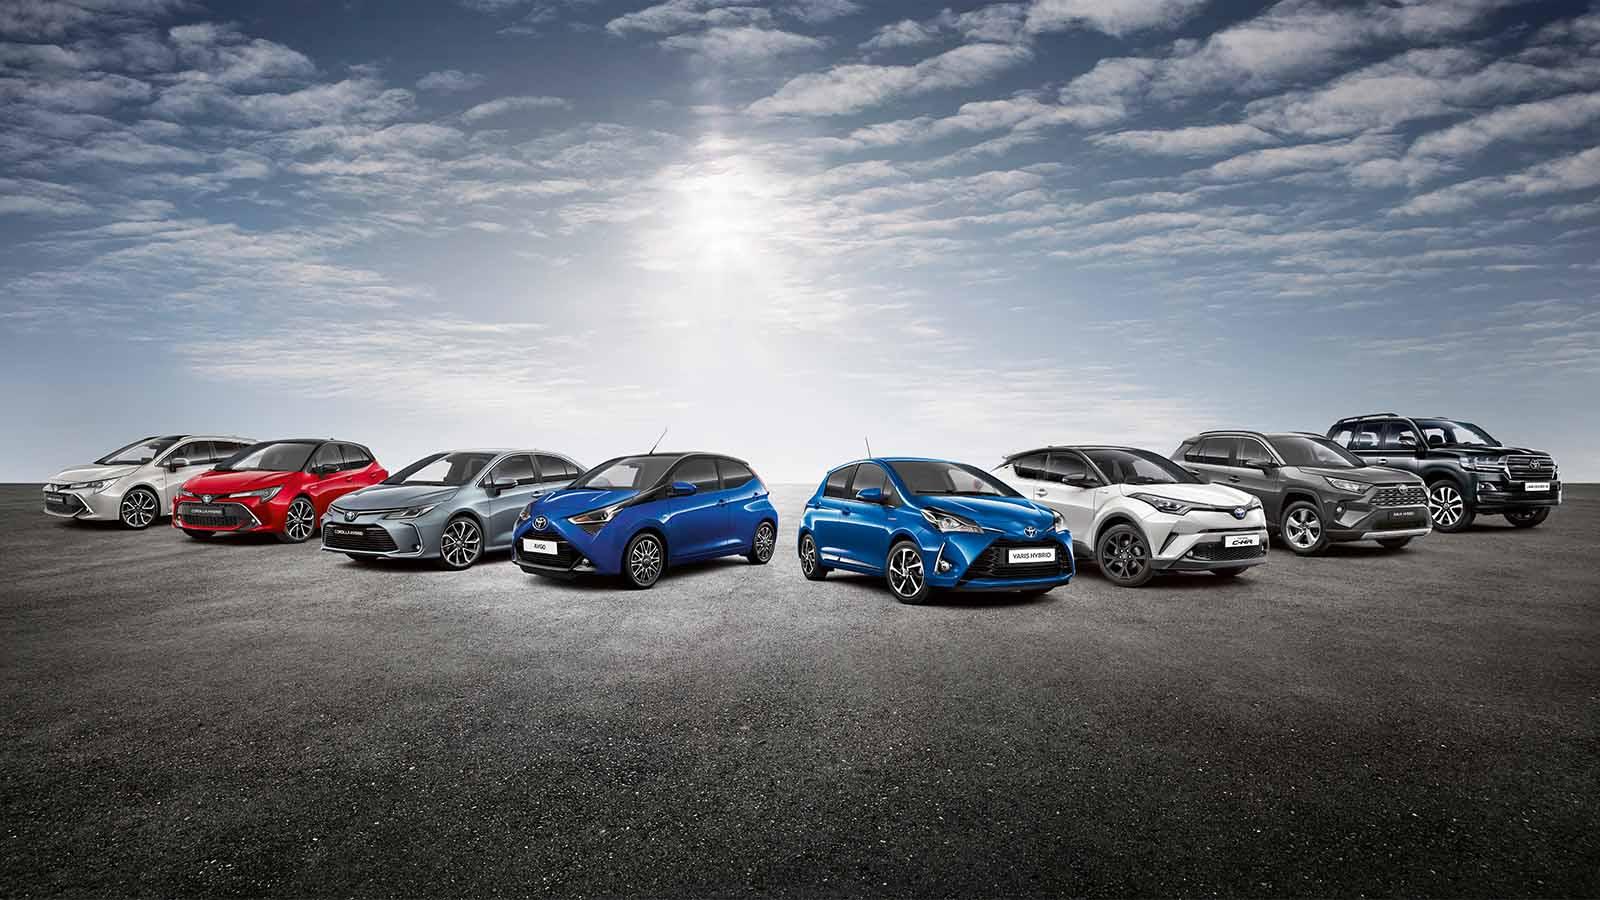 Toyota S Range Of Efficient Petrol Vehicles Toyota Motor Europe